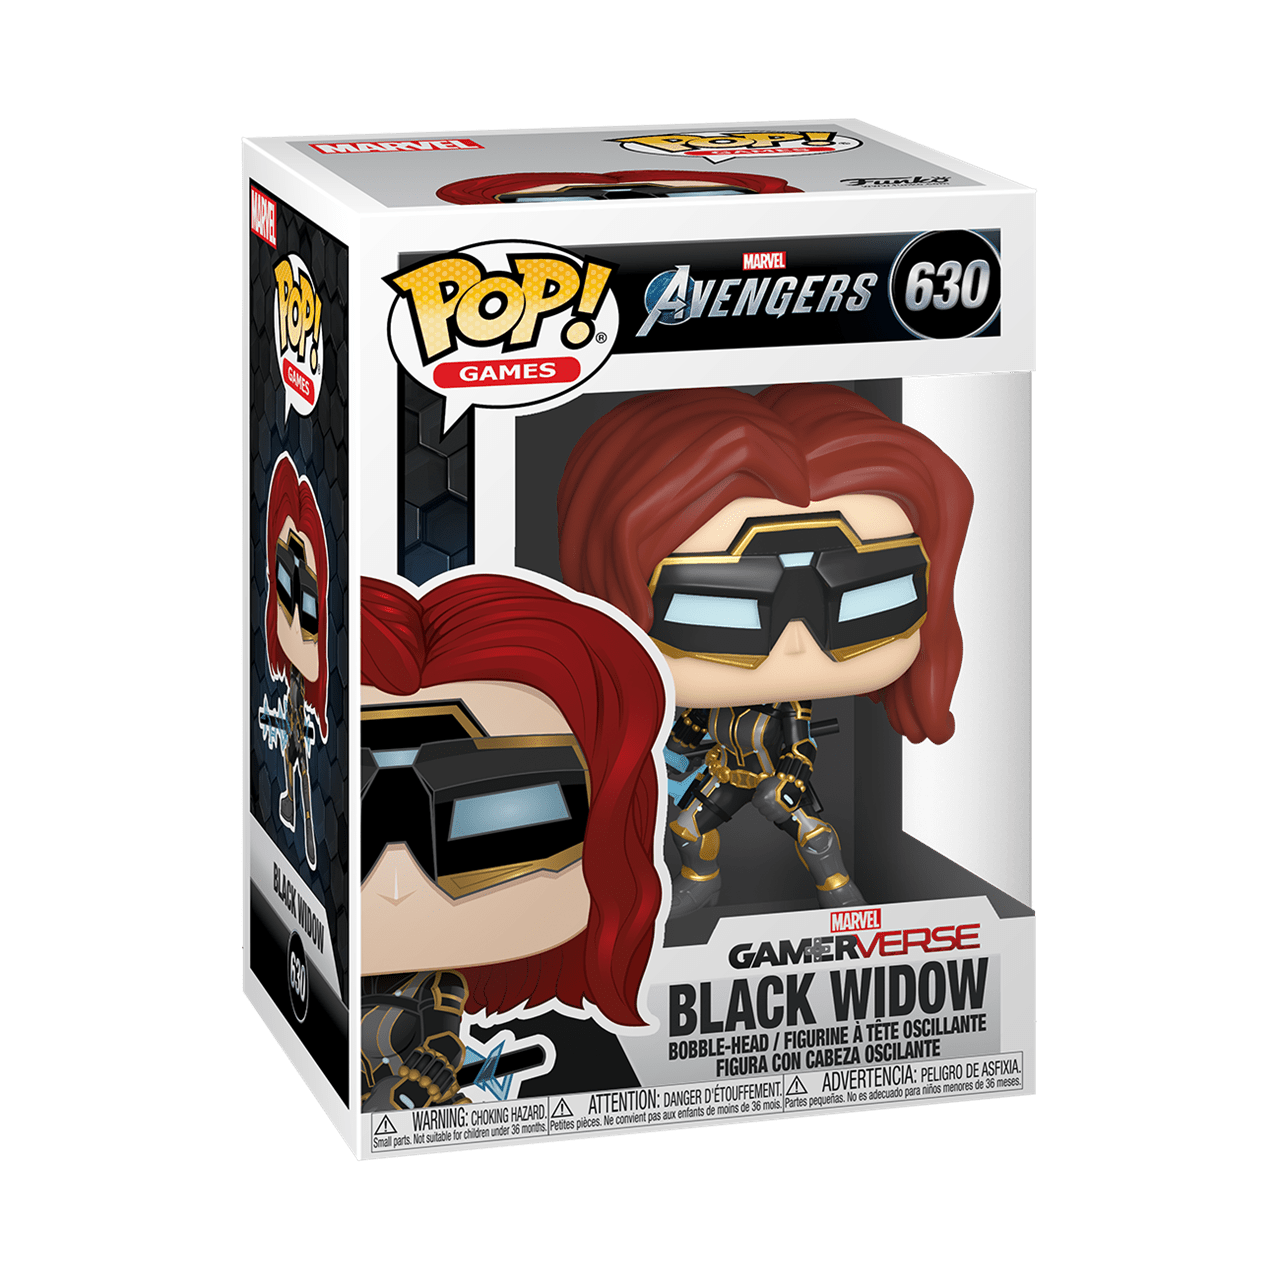 Black Widow (630) Avengers Gamerverse Marvel Pop Vinyl (Glow in the Dark Chase) - 3